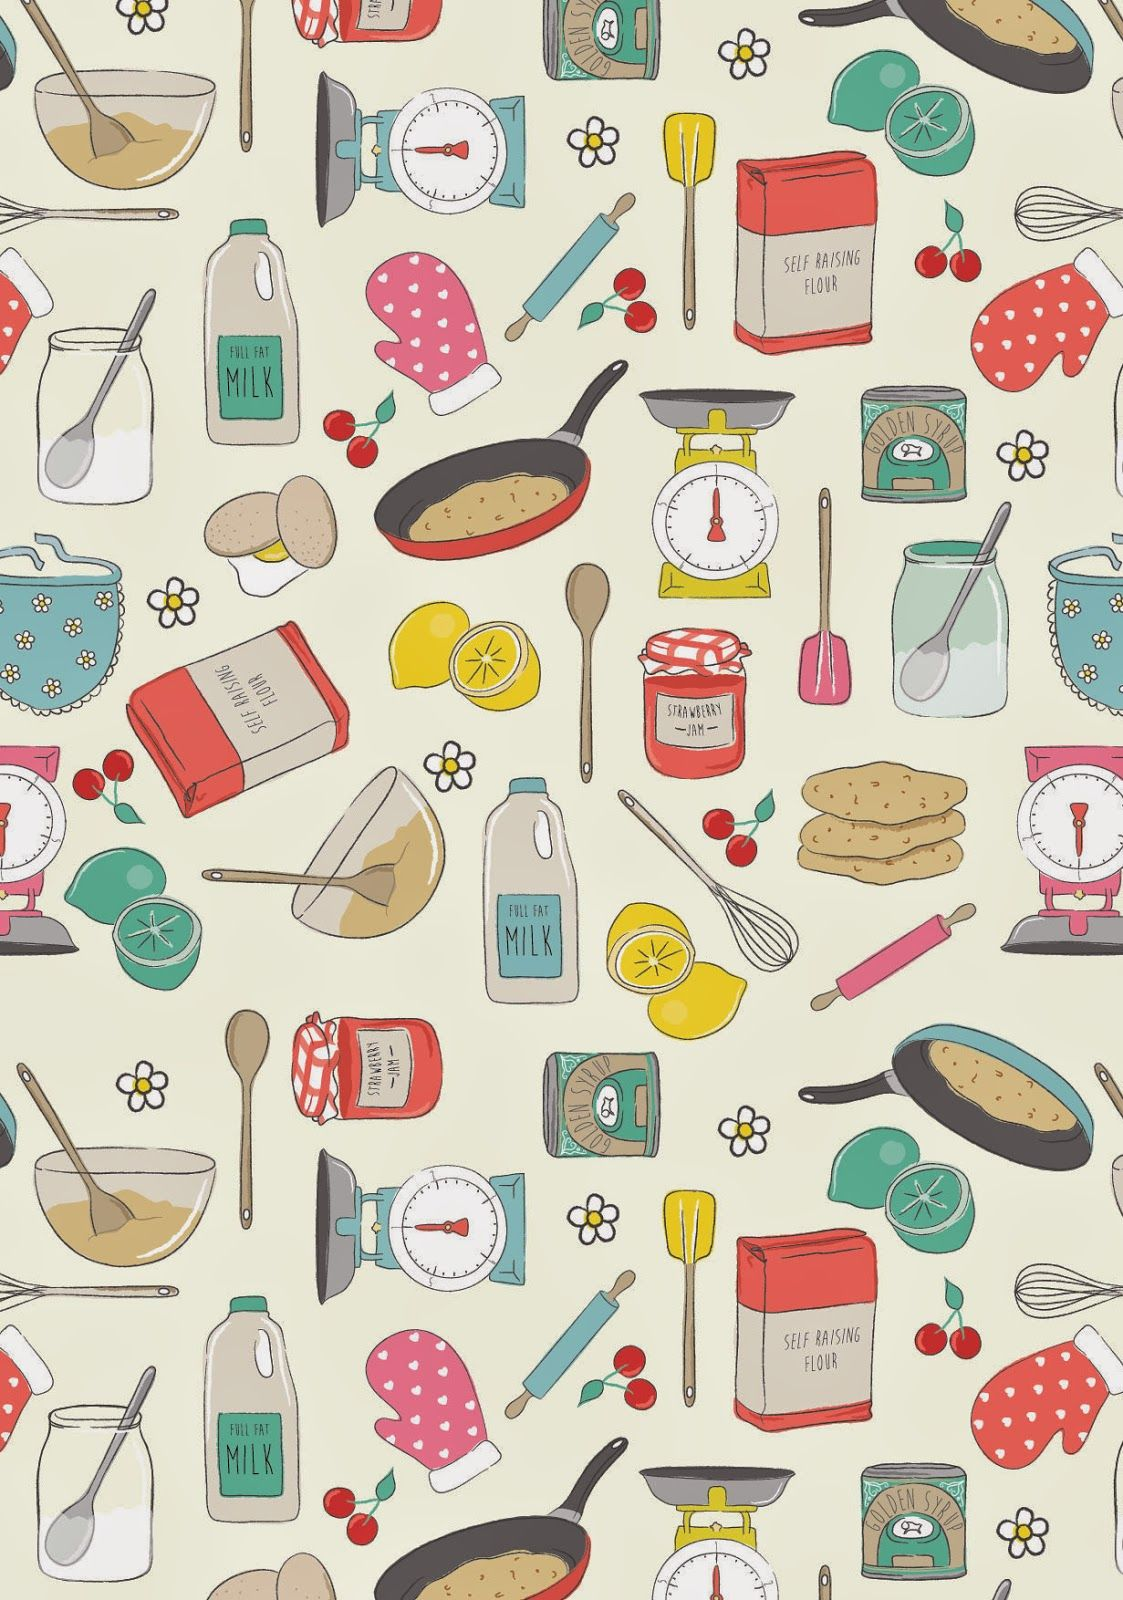 emily kiddy | Emily Kiddy: Shrove Tuesday - Pancake Day ...